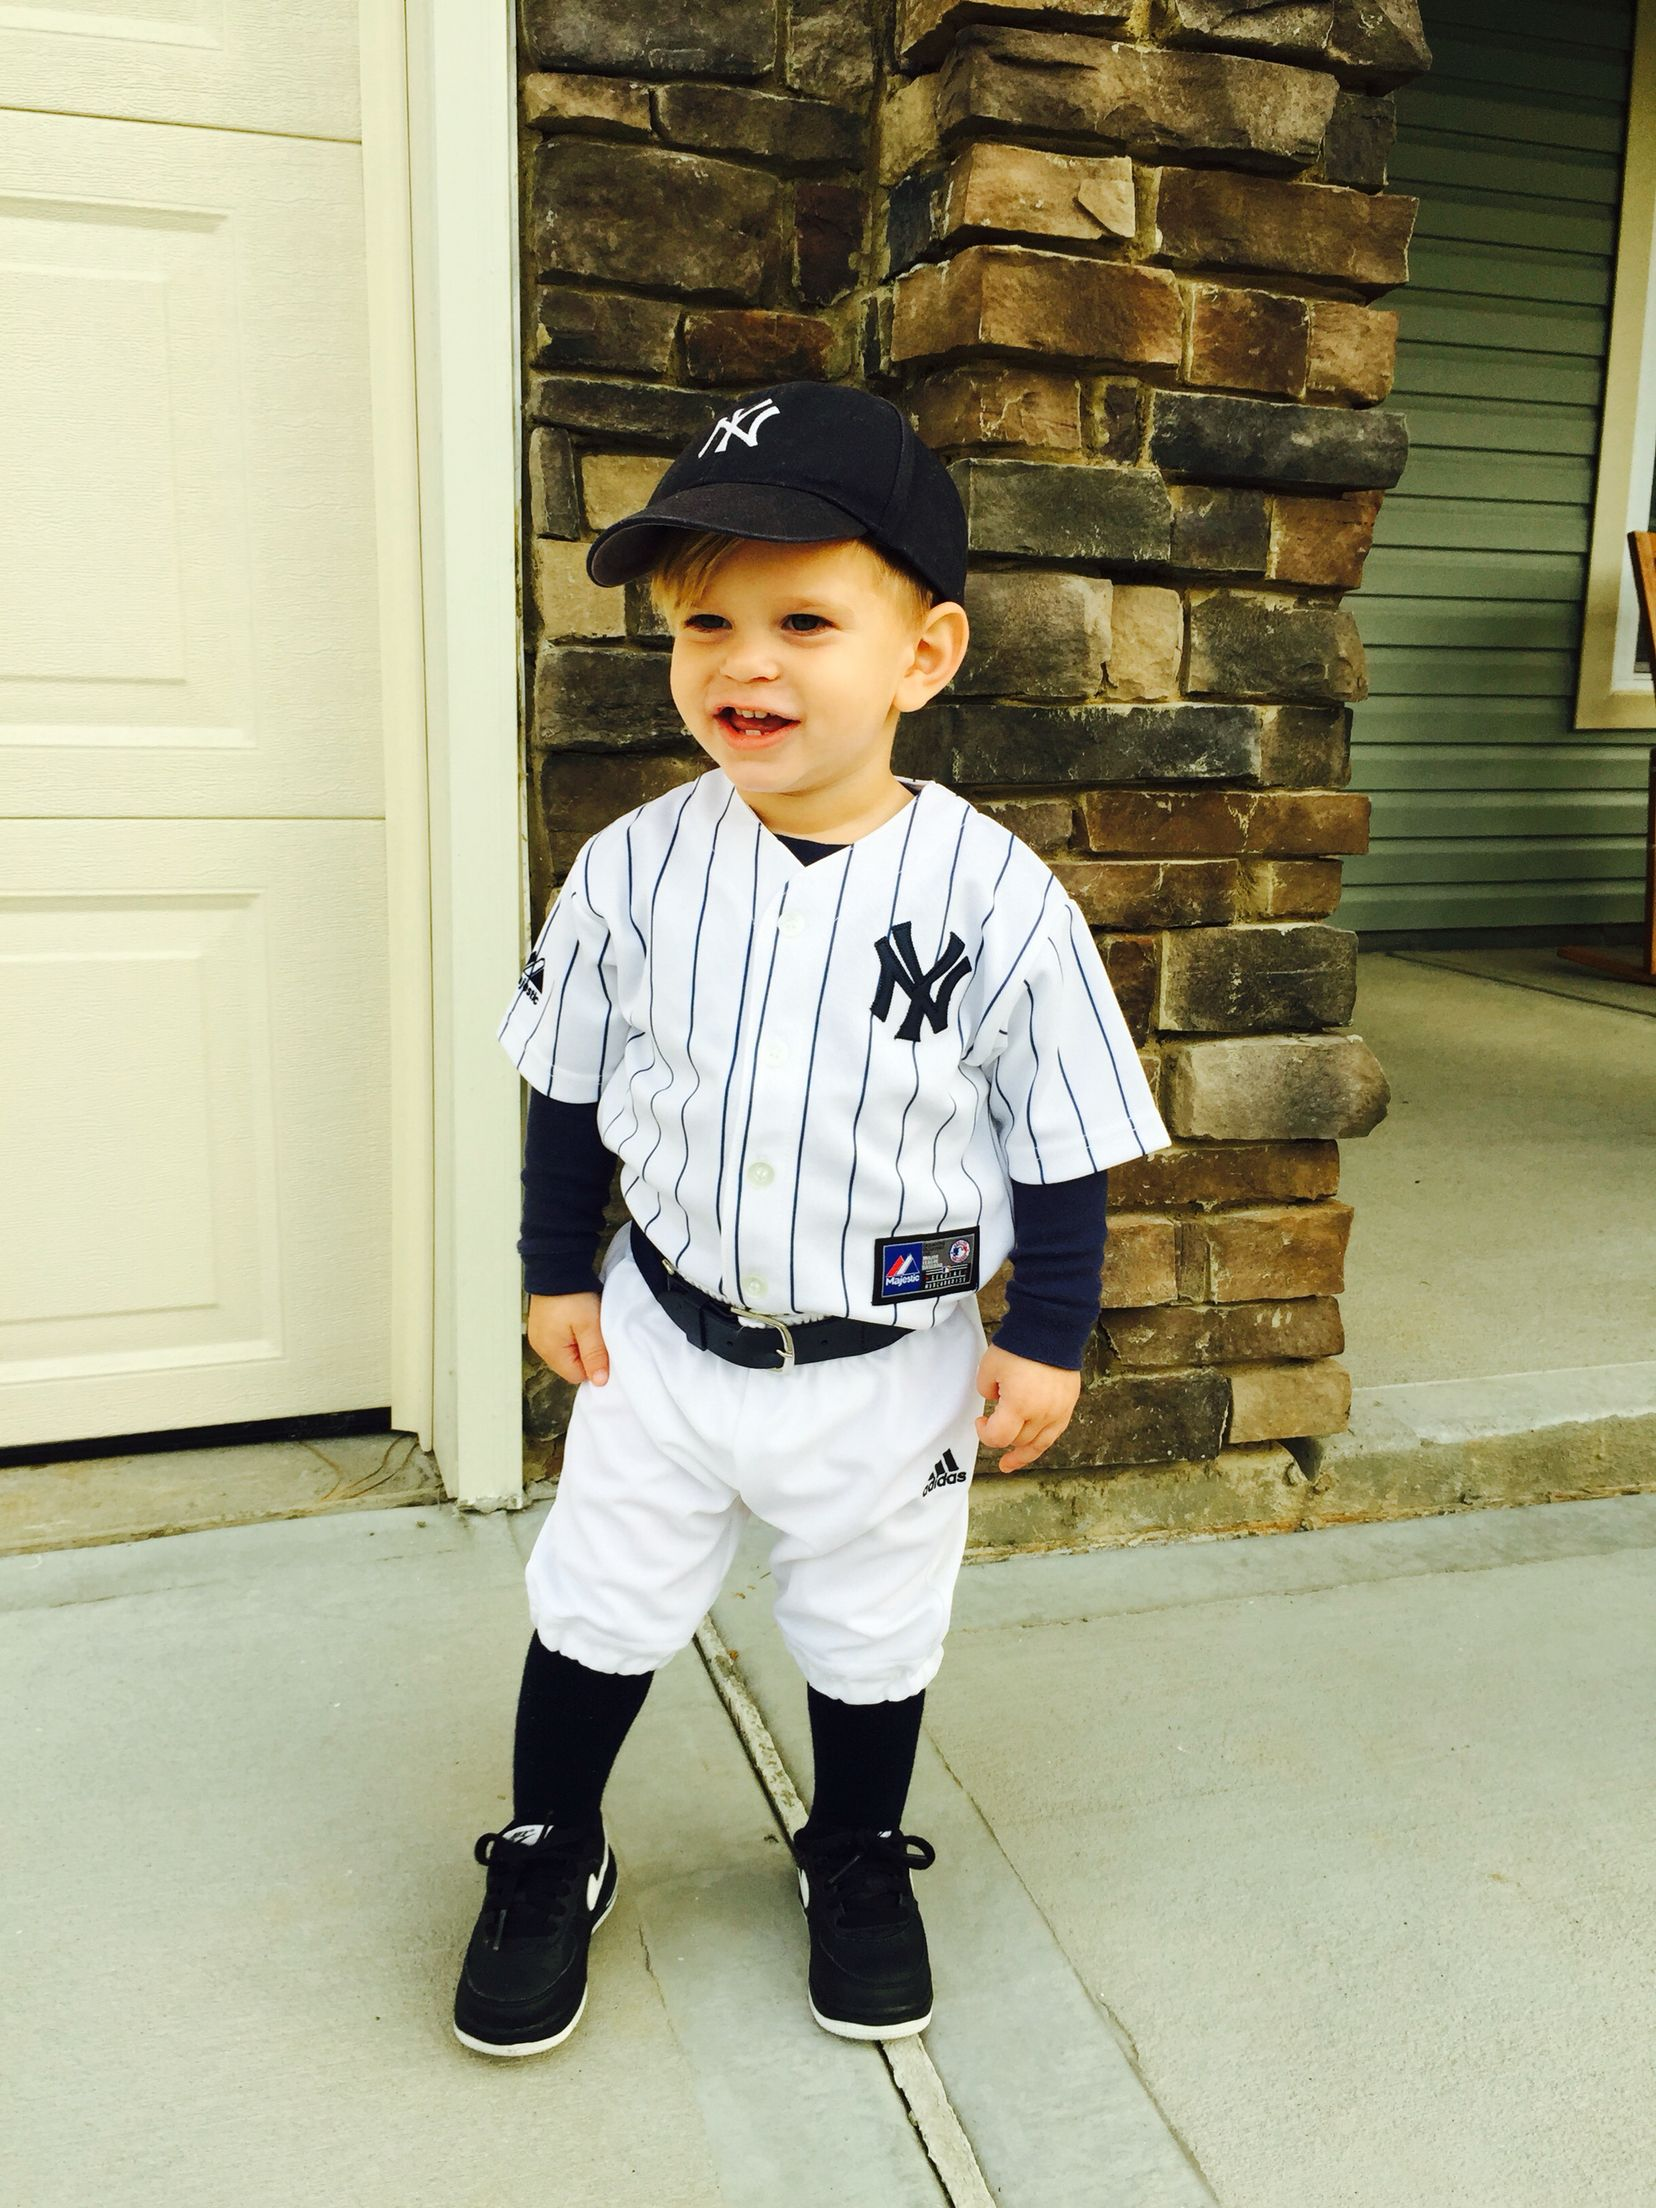 Cole David 2014: Halloween costume toddler baseball player, Yankees, Derek Jeter